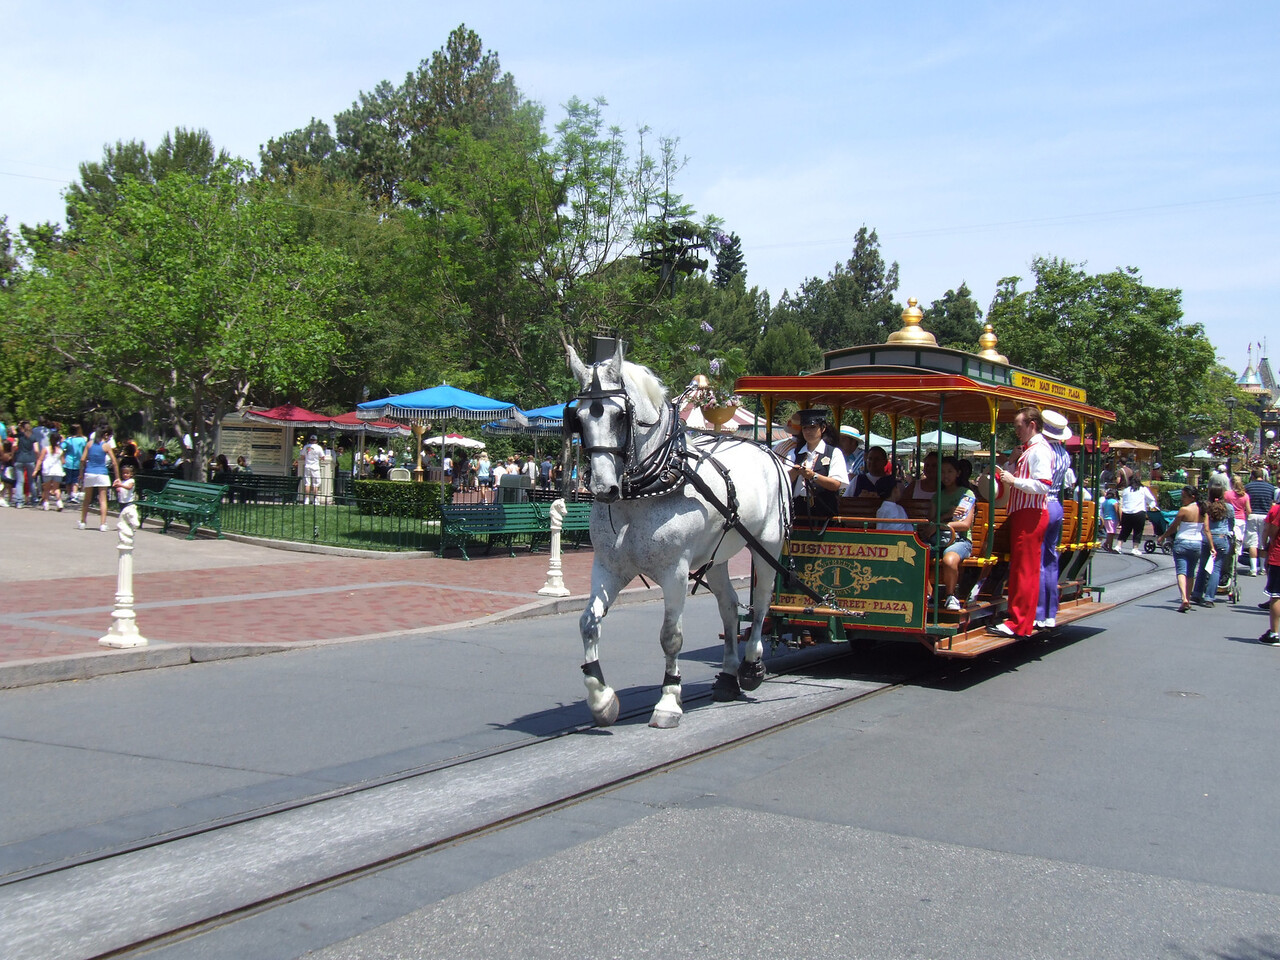 The Dapper Dans enjoying the trolley down Main Street